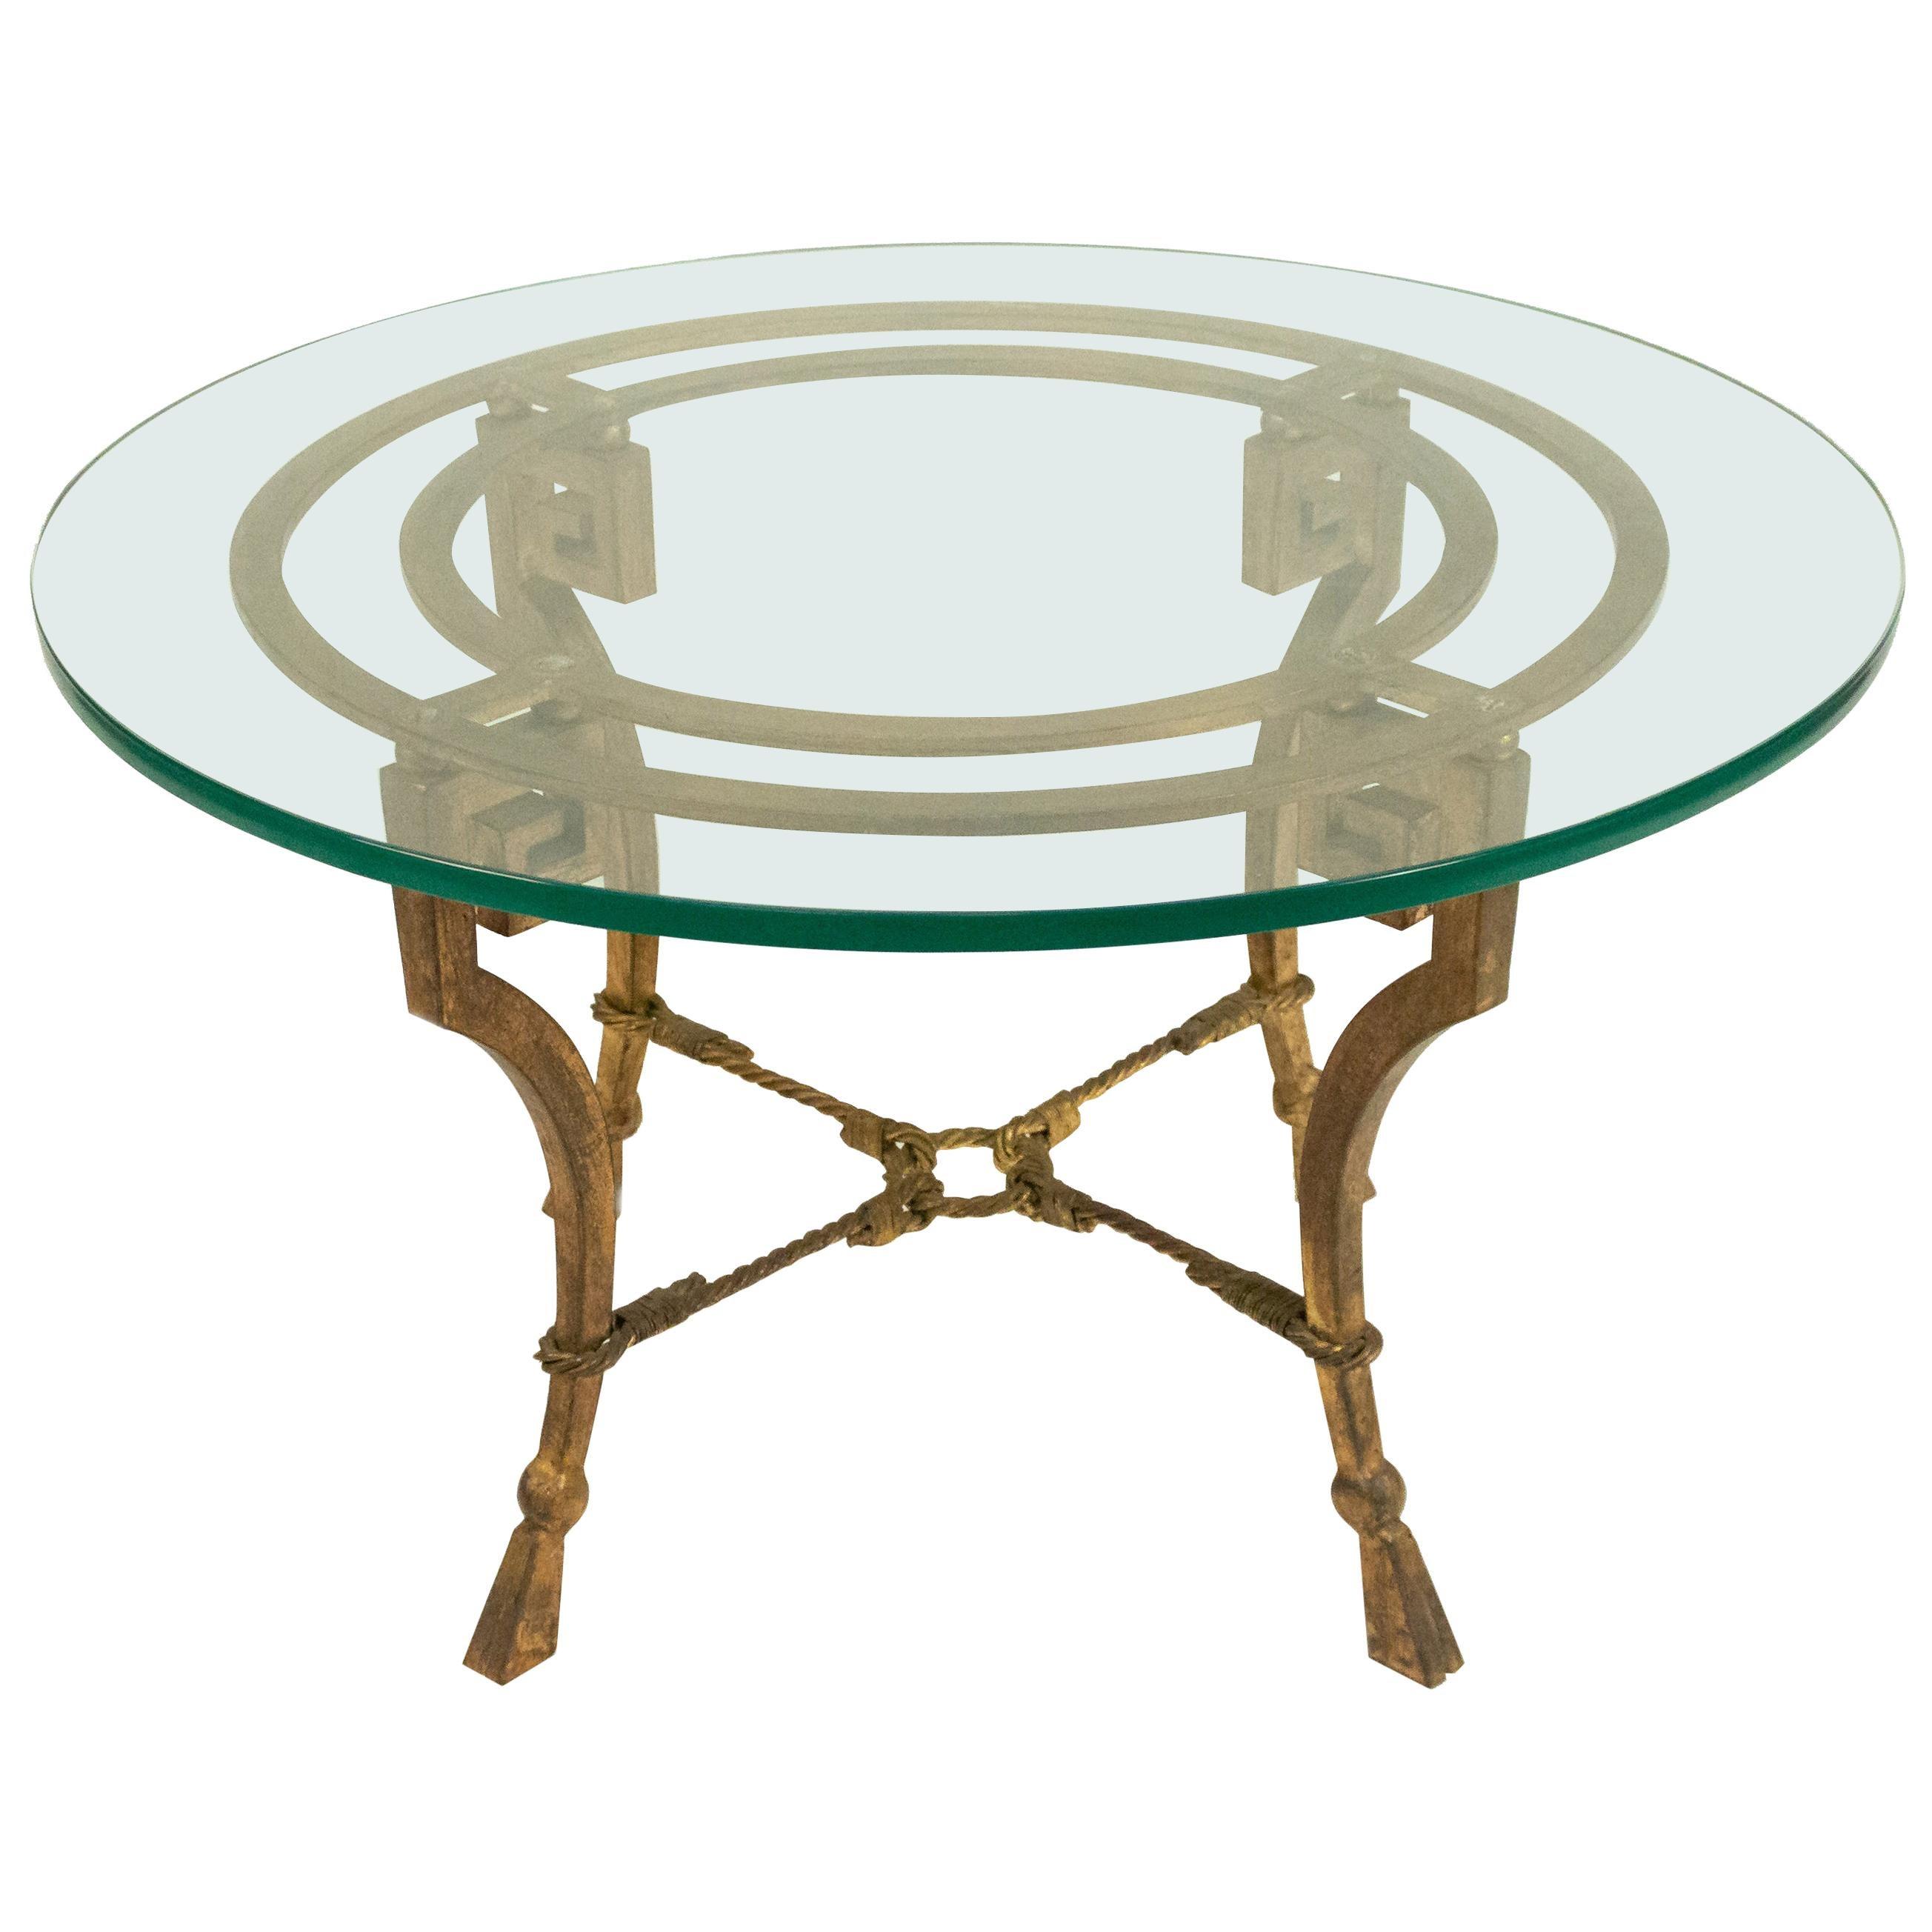 Maison Ramsay Iron Coffee Table